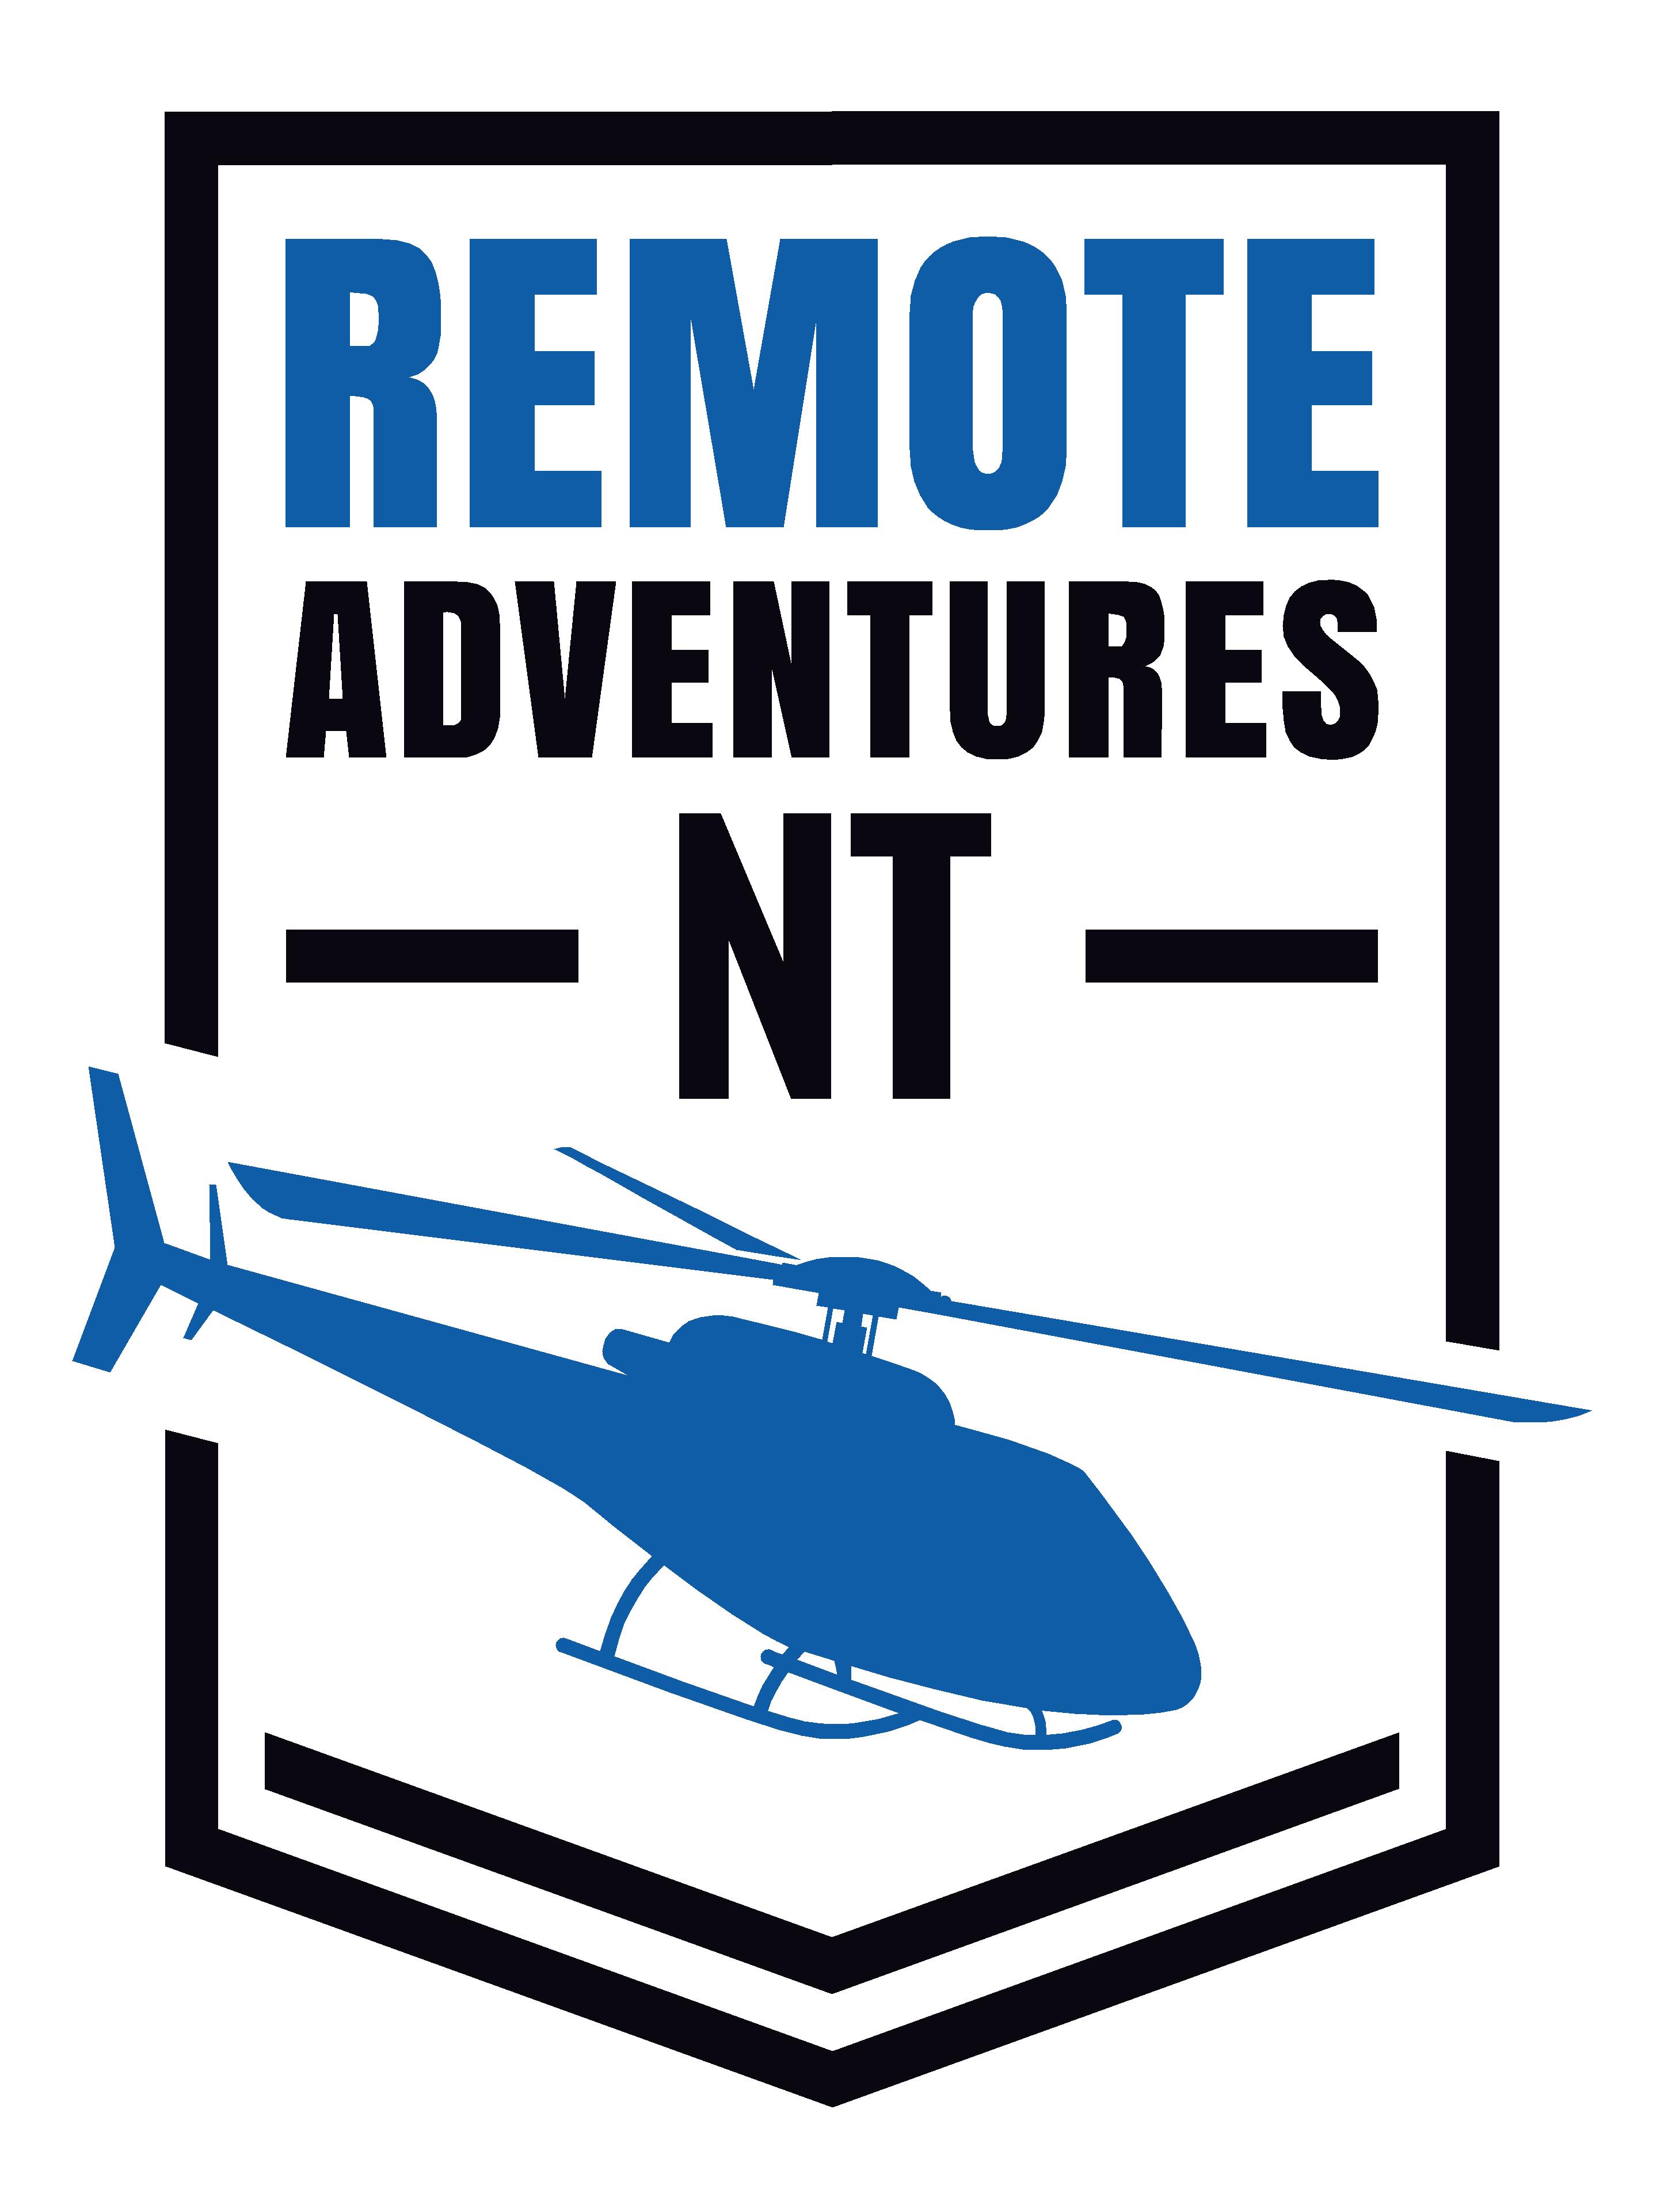 Remote Adventures NT